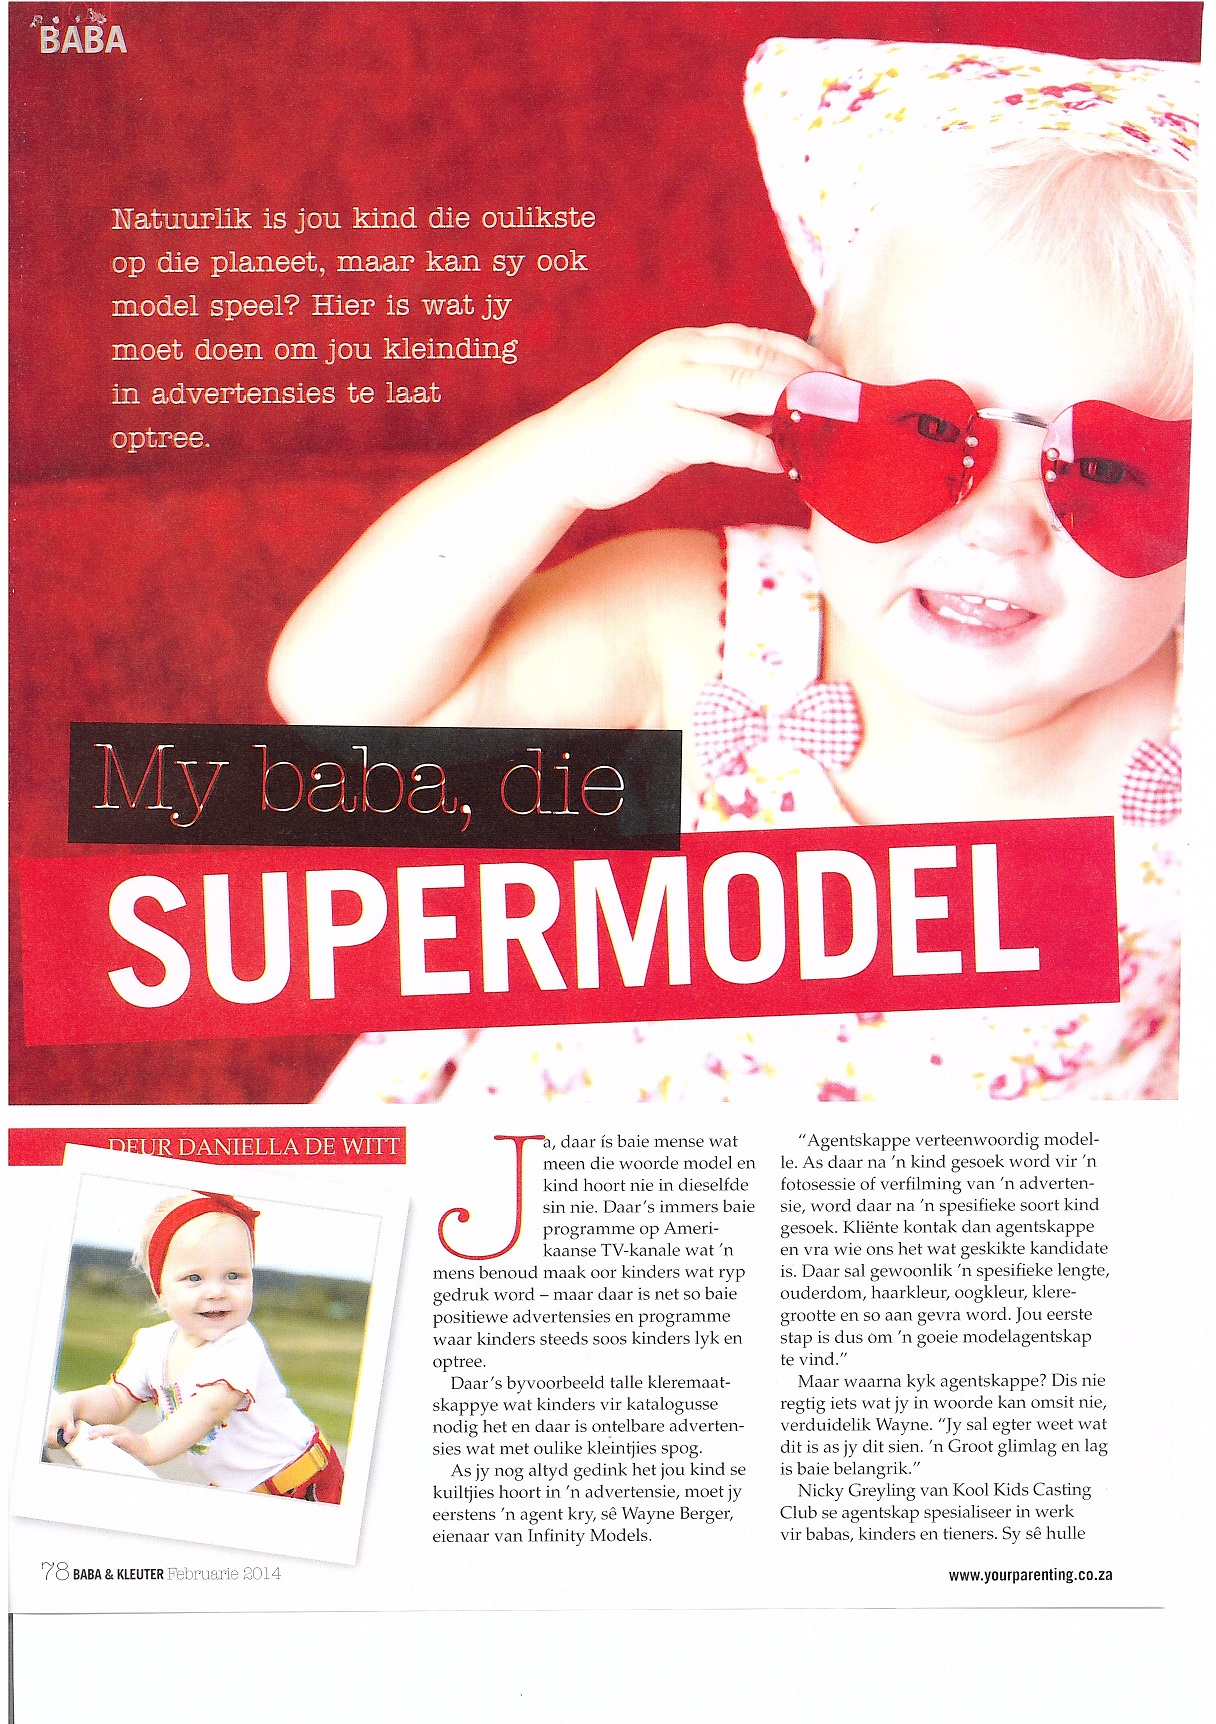 Baba en Kleuter Magazine Feb 2014 Article on Casting Industry Featuring Kool Kids P2